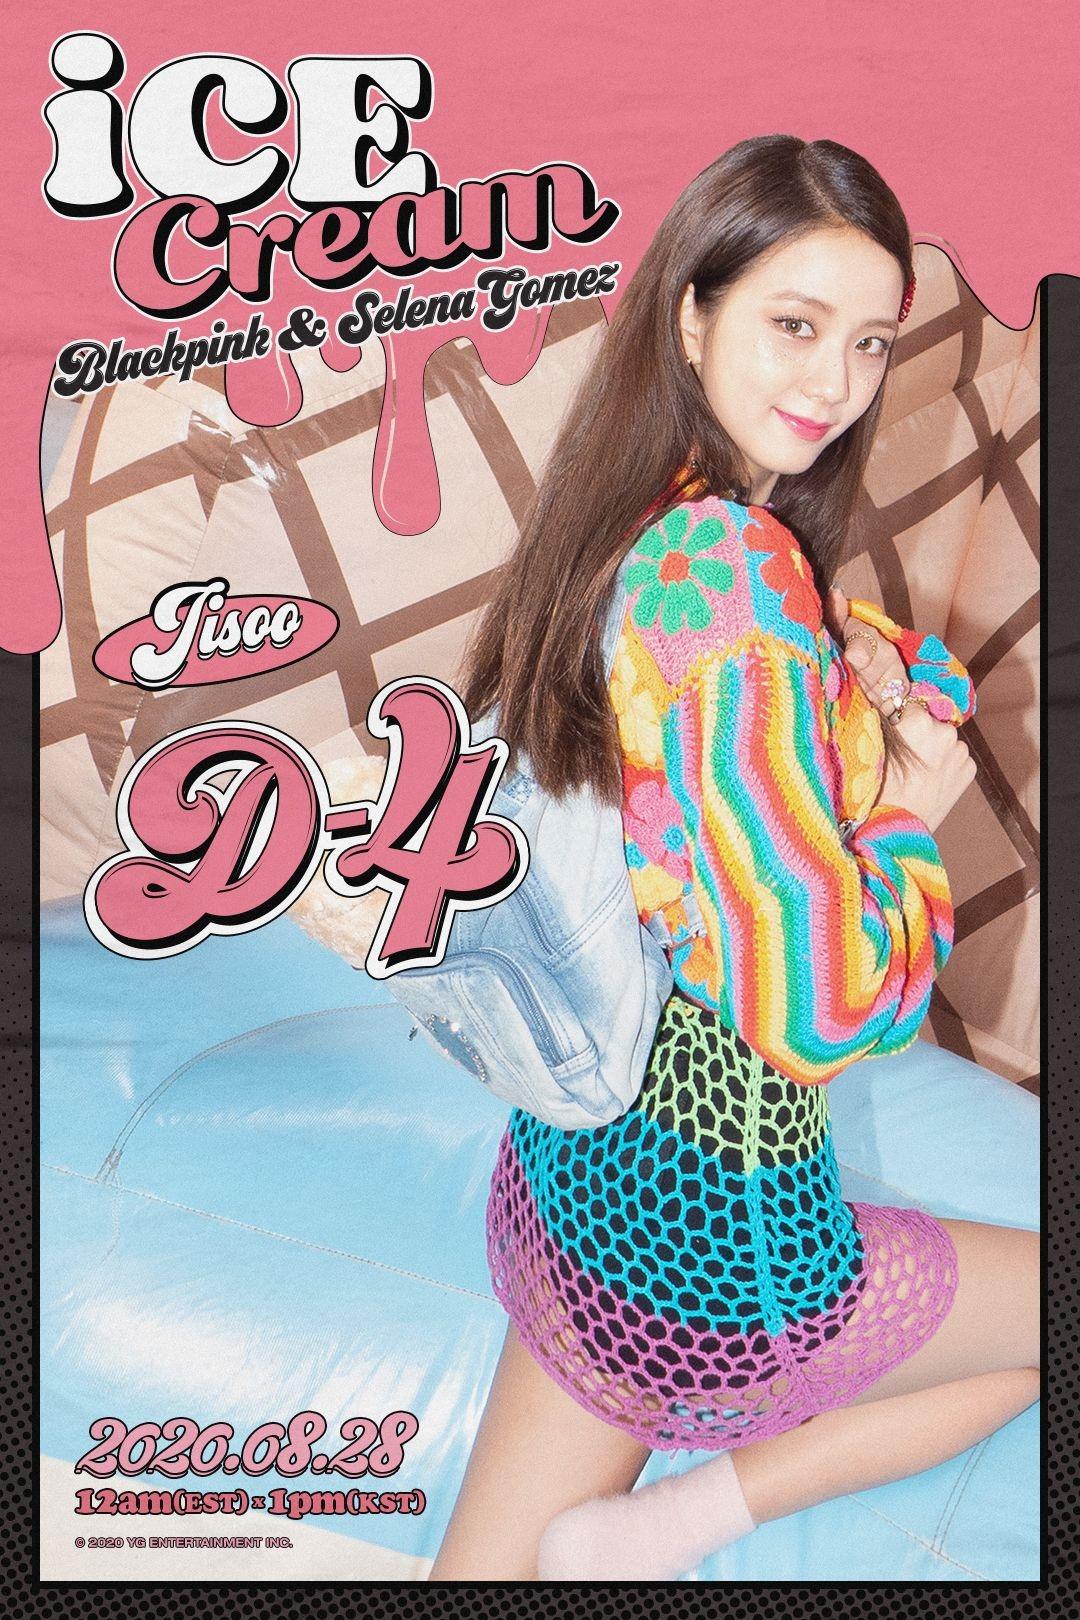 Jisoo blackpink mặc đồ đan móc trong mv ice cream